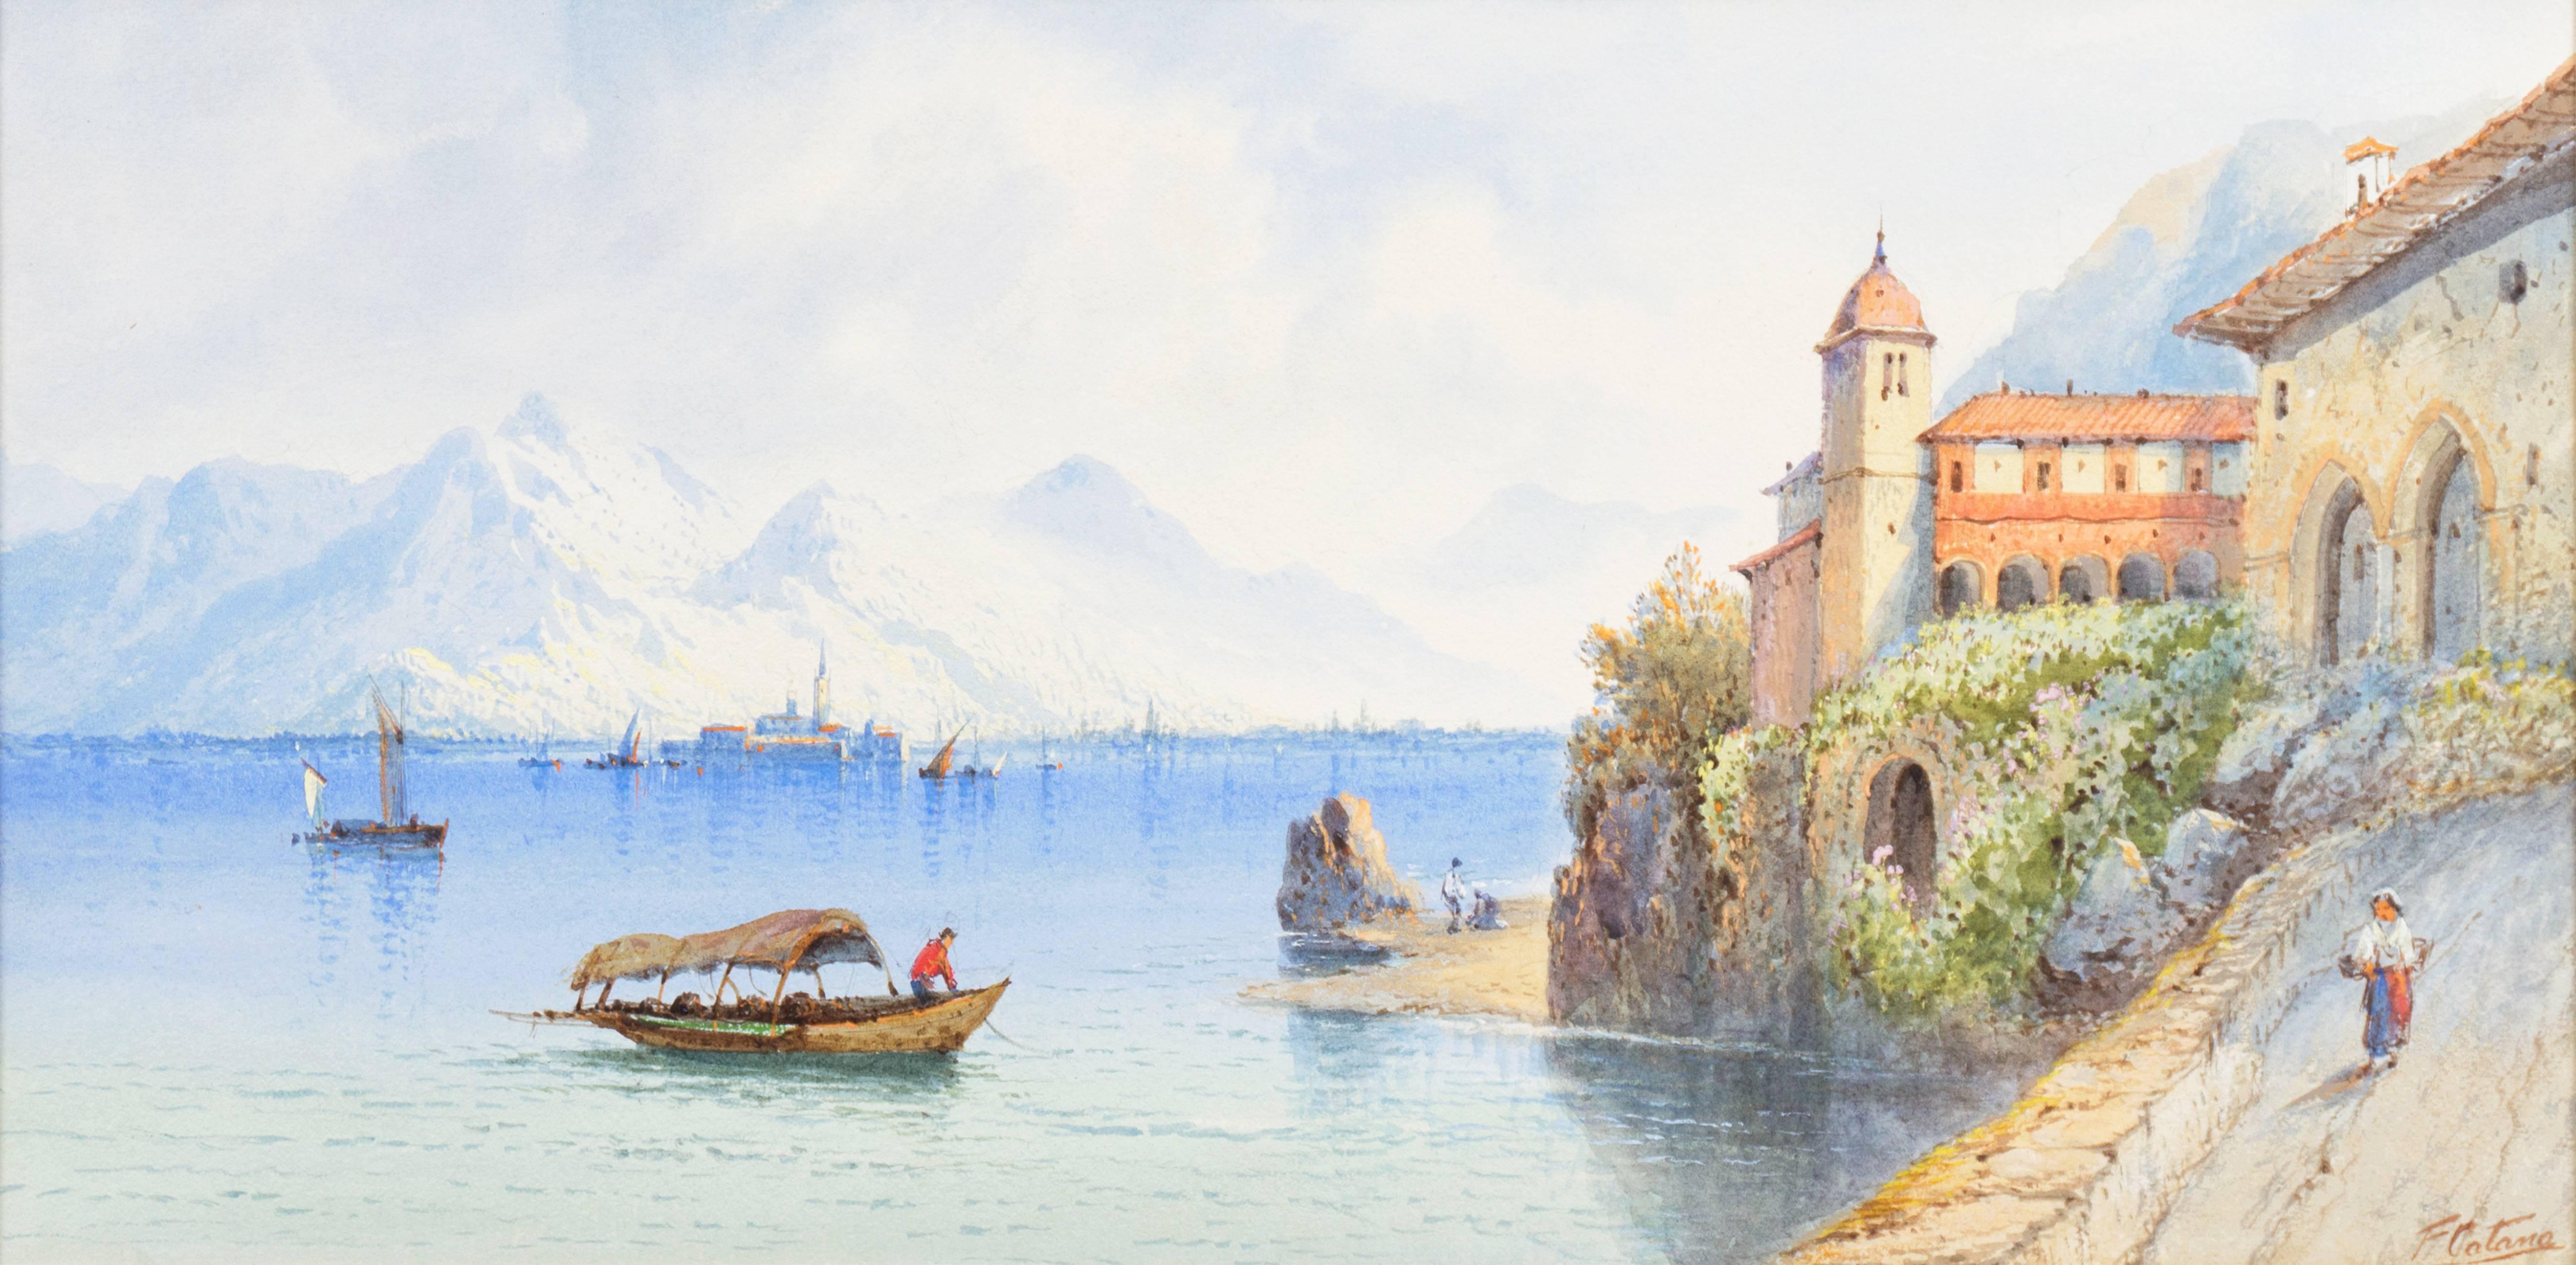 View of Lake Como, Italy